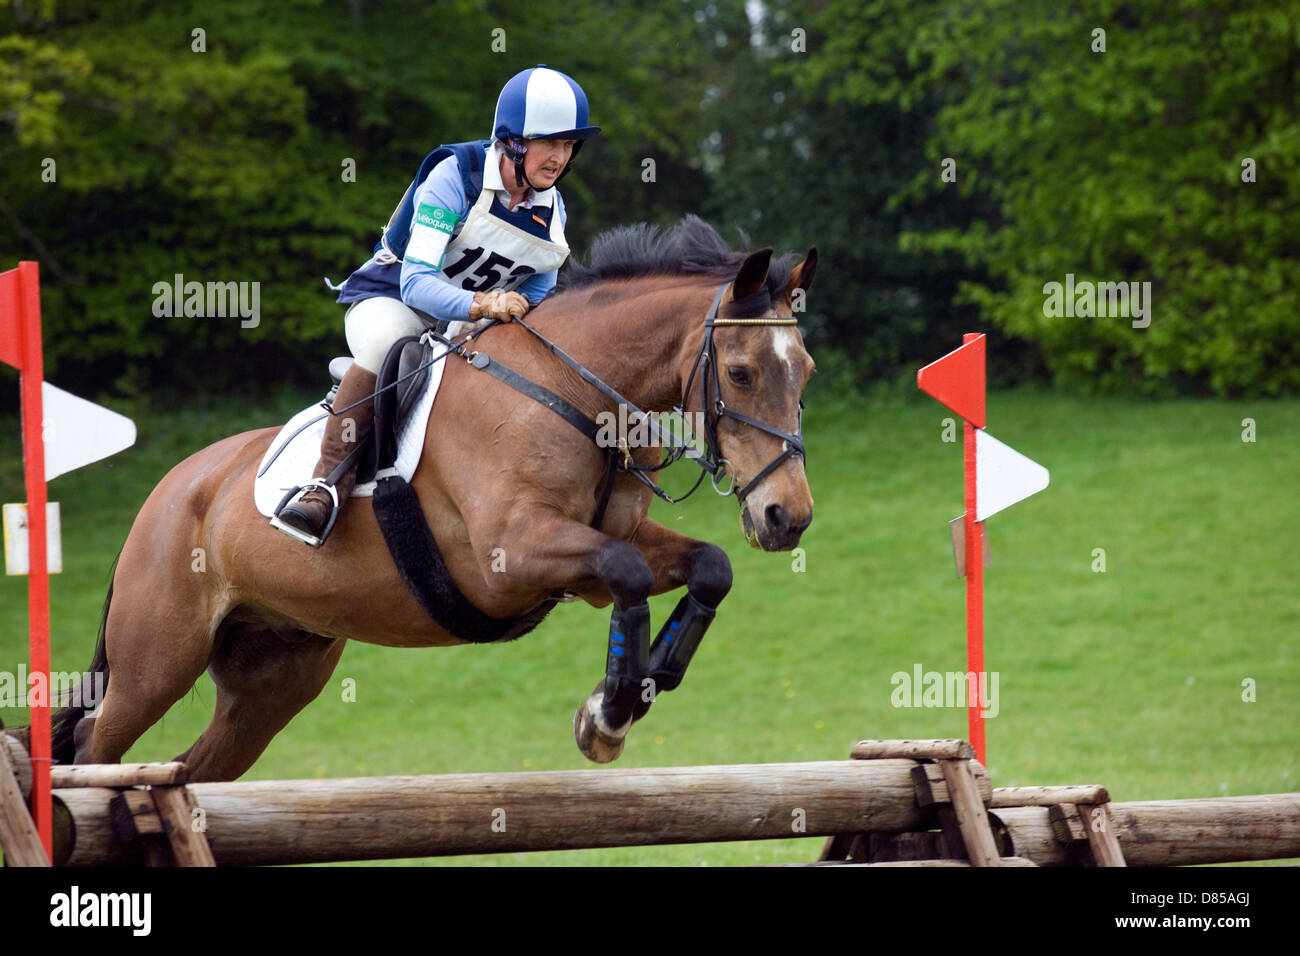 Hampshire: evento de cross-country ecuestre Imagen De Stock